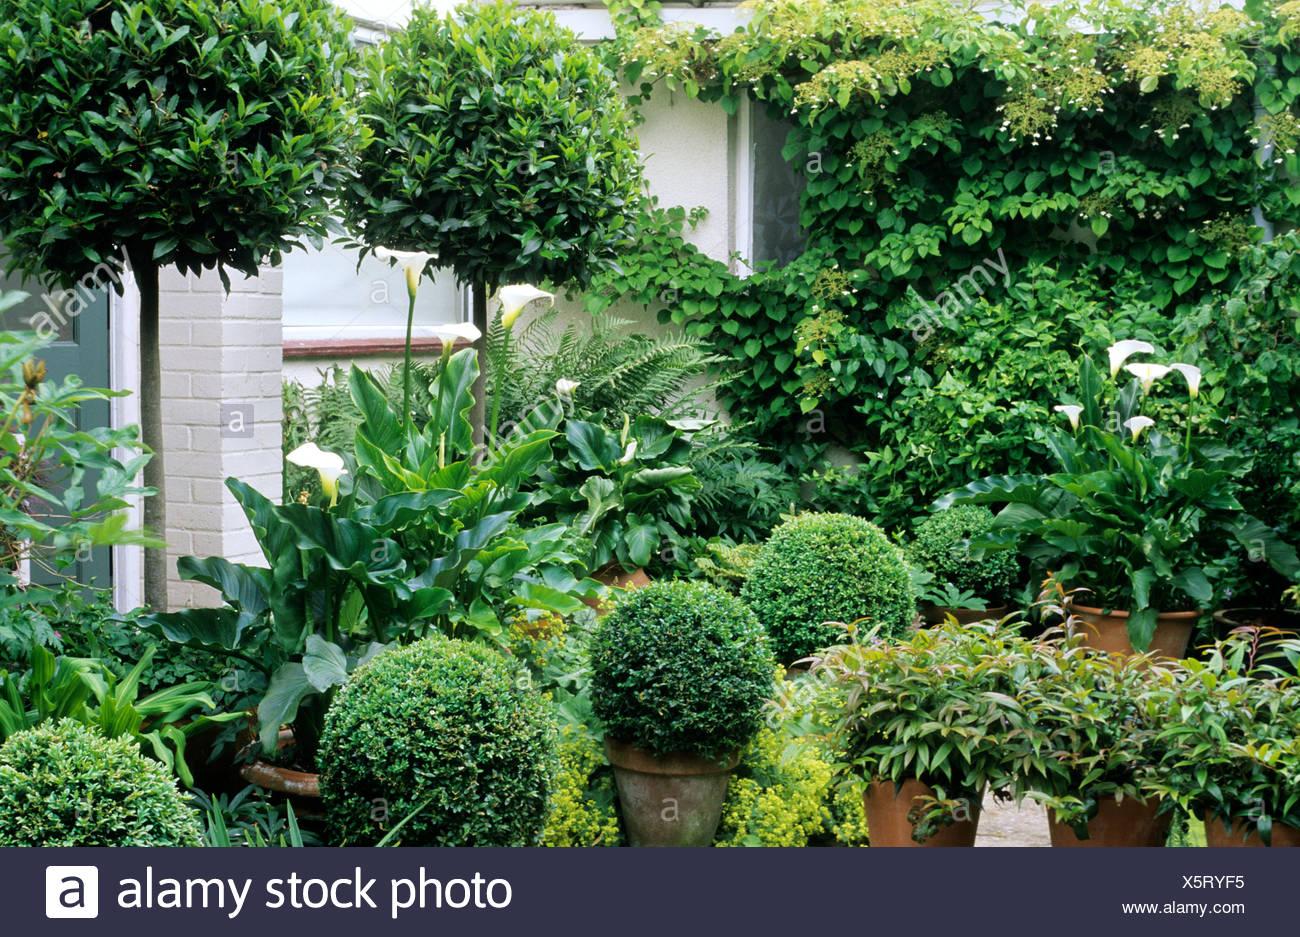 Green And White Topiary Garden Box Standard Bay Balls